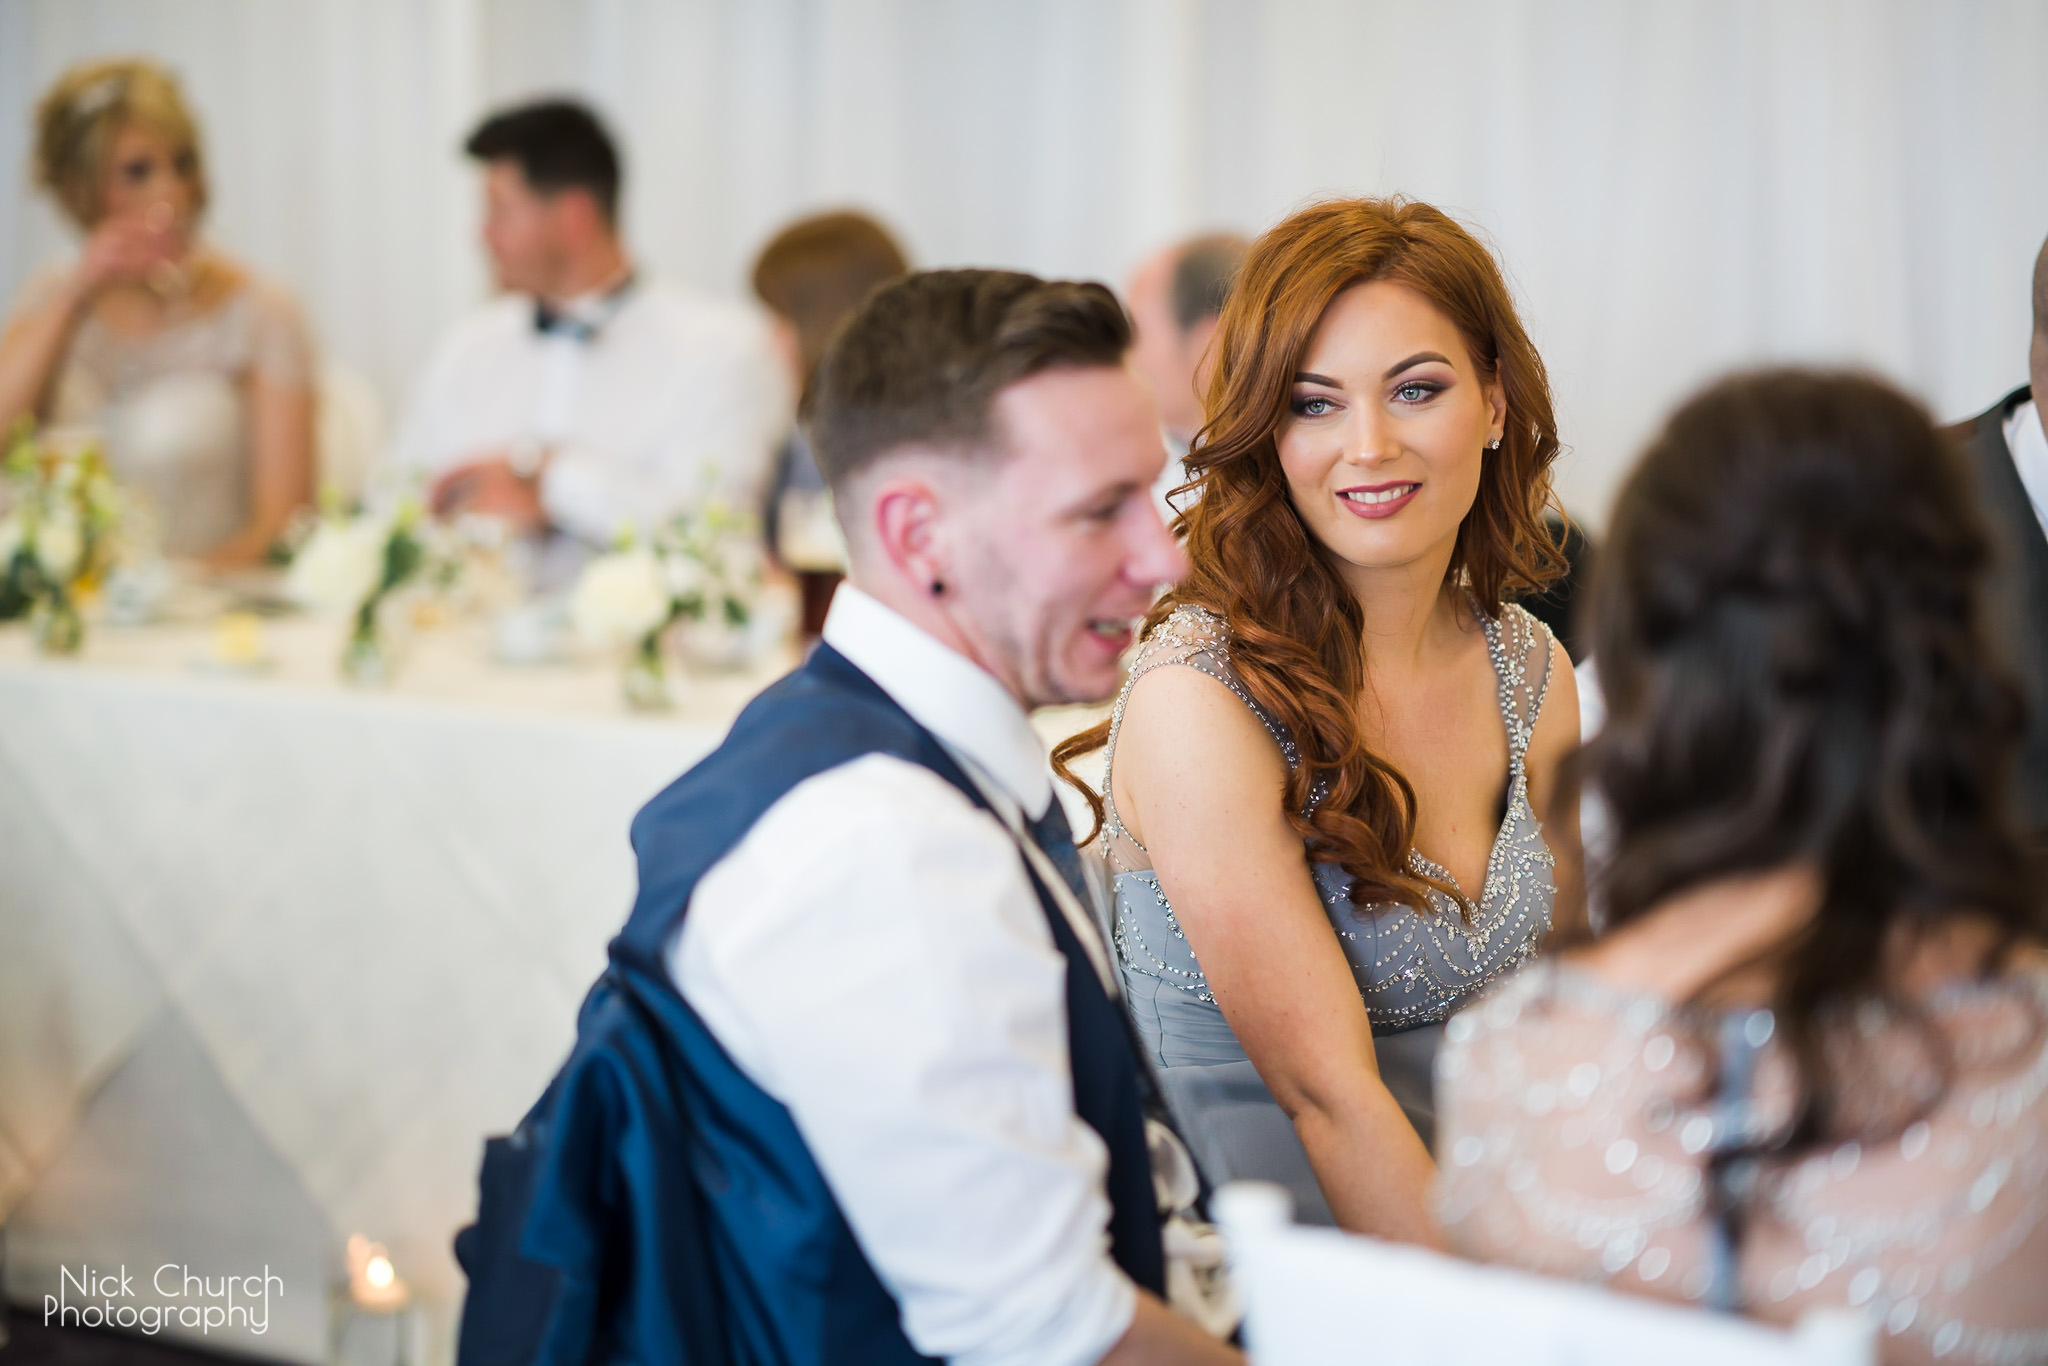 NC-20180317-stacy-and-mike-wedding-1702.jpg